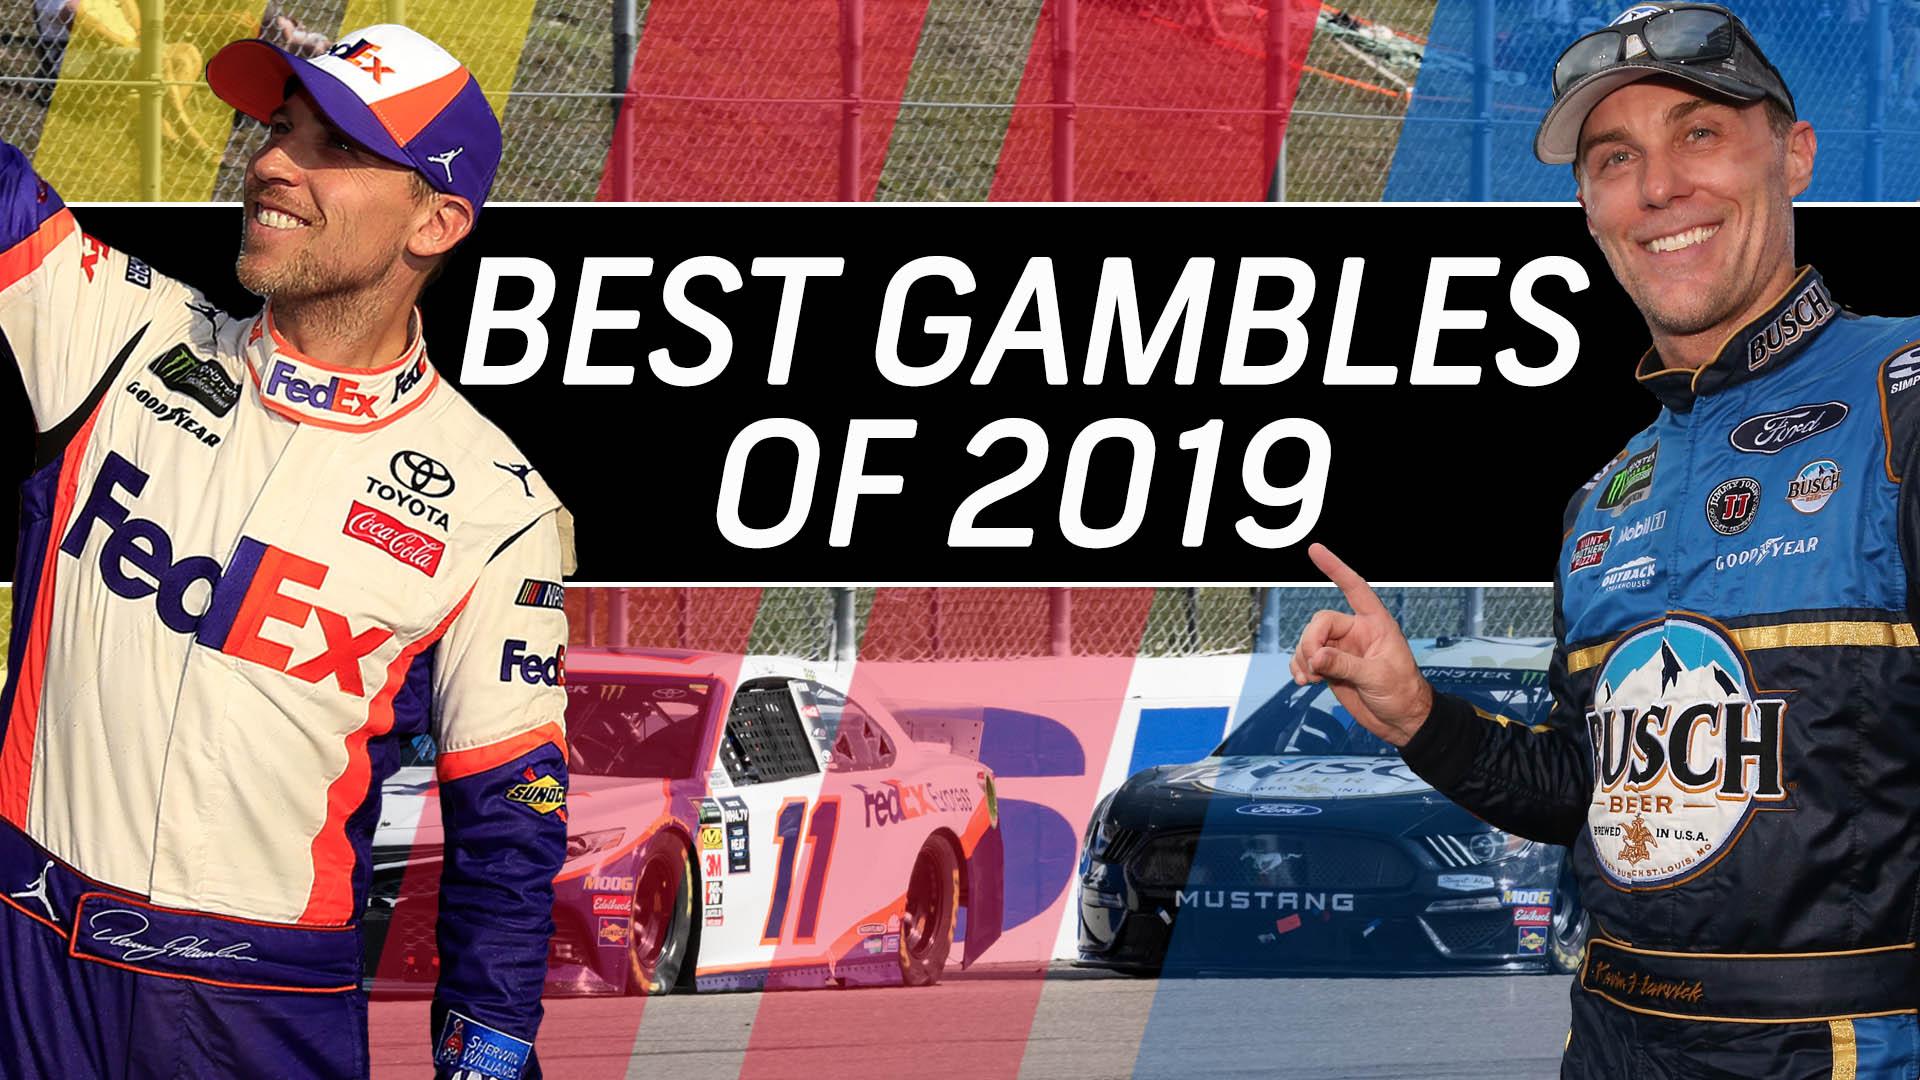 Top NASCAR Cup Series, Gander Outdoors Truck Series gambles of 2019